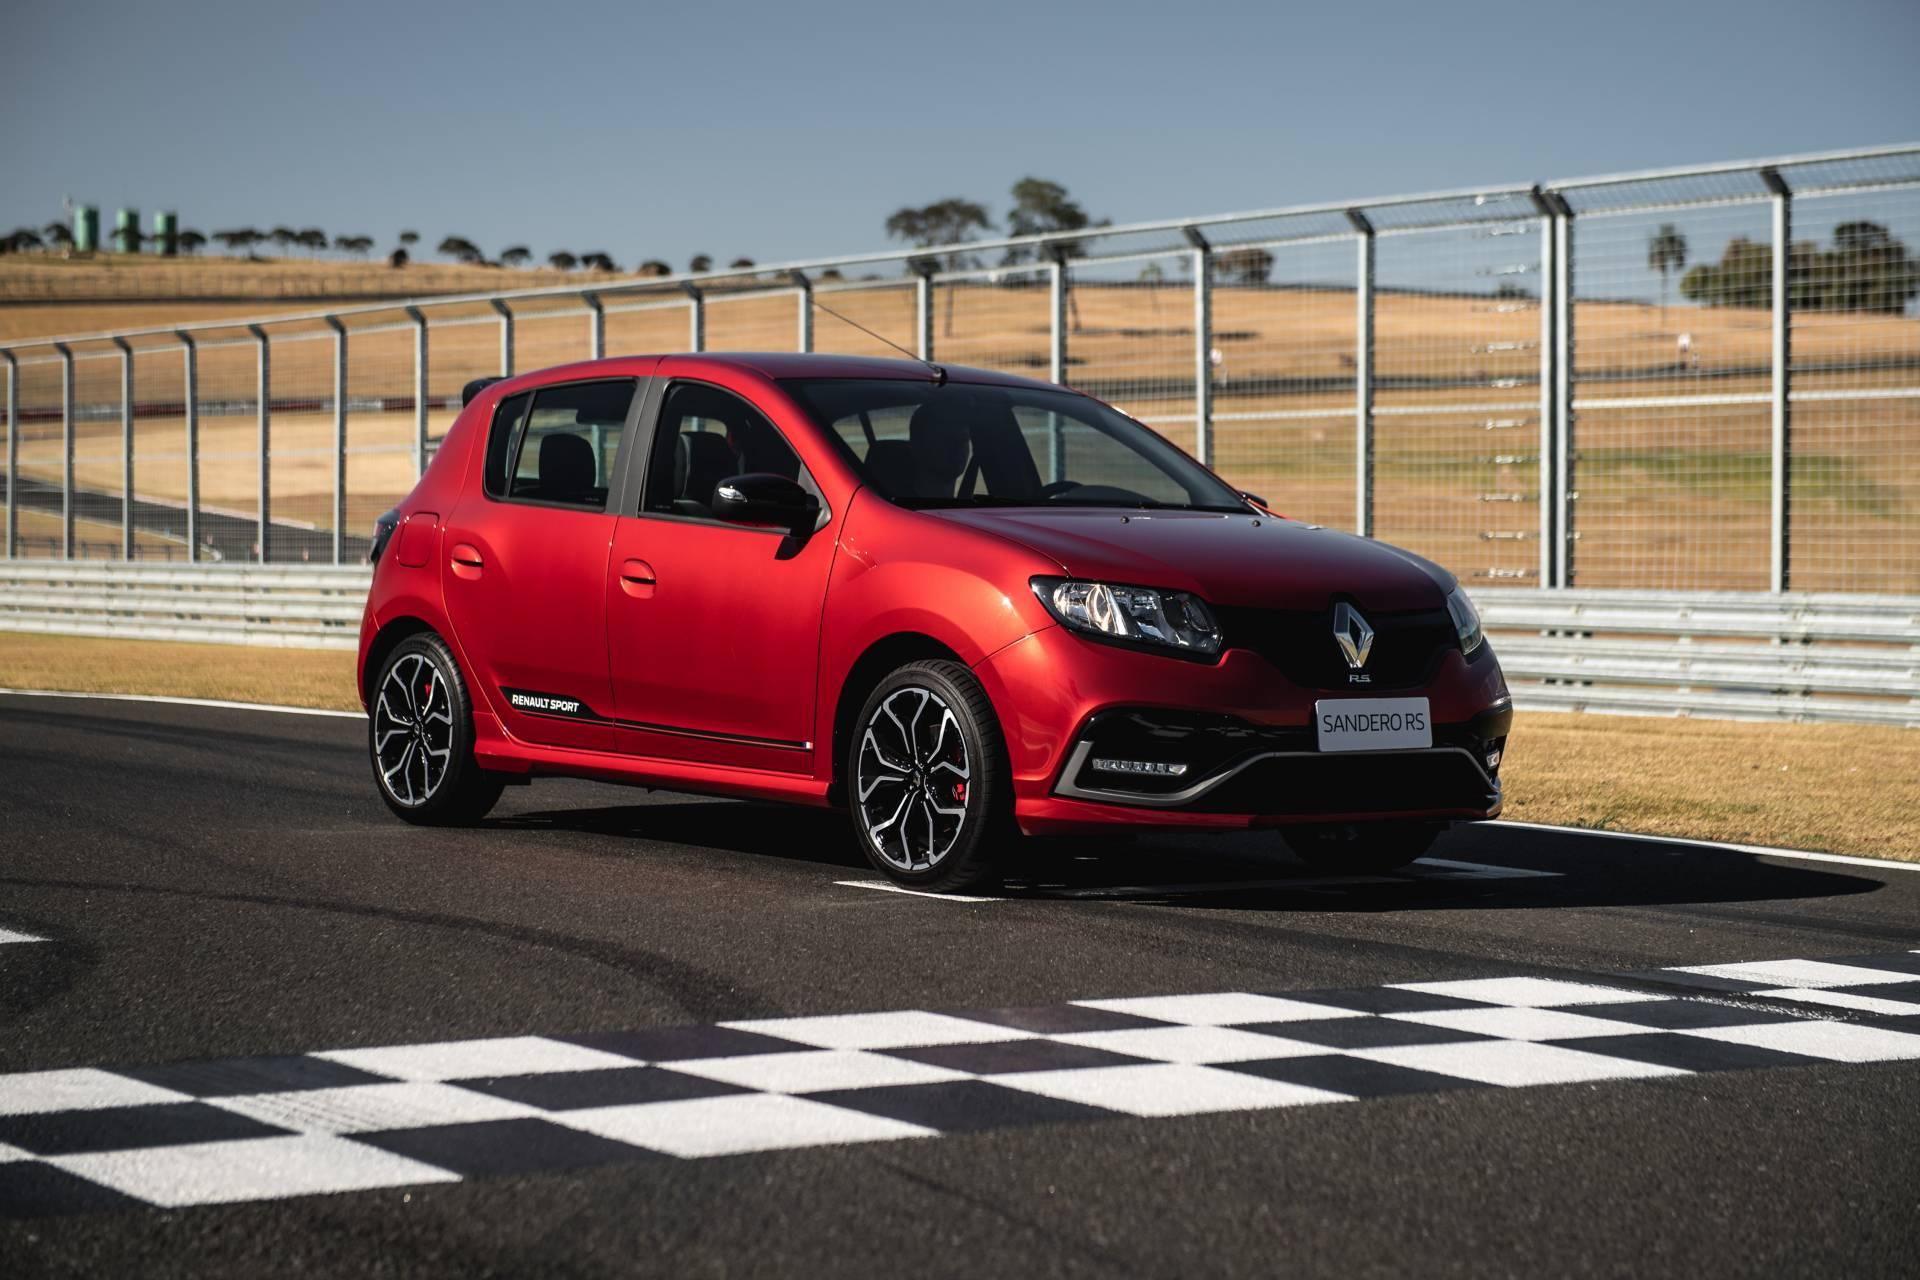 2020_Renault_Sandero_RS_facelift_0025